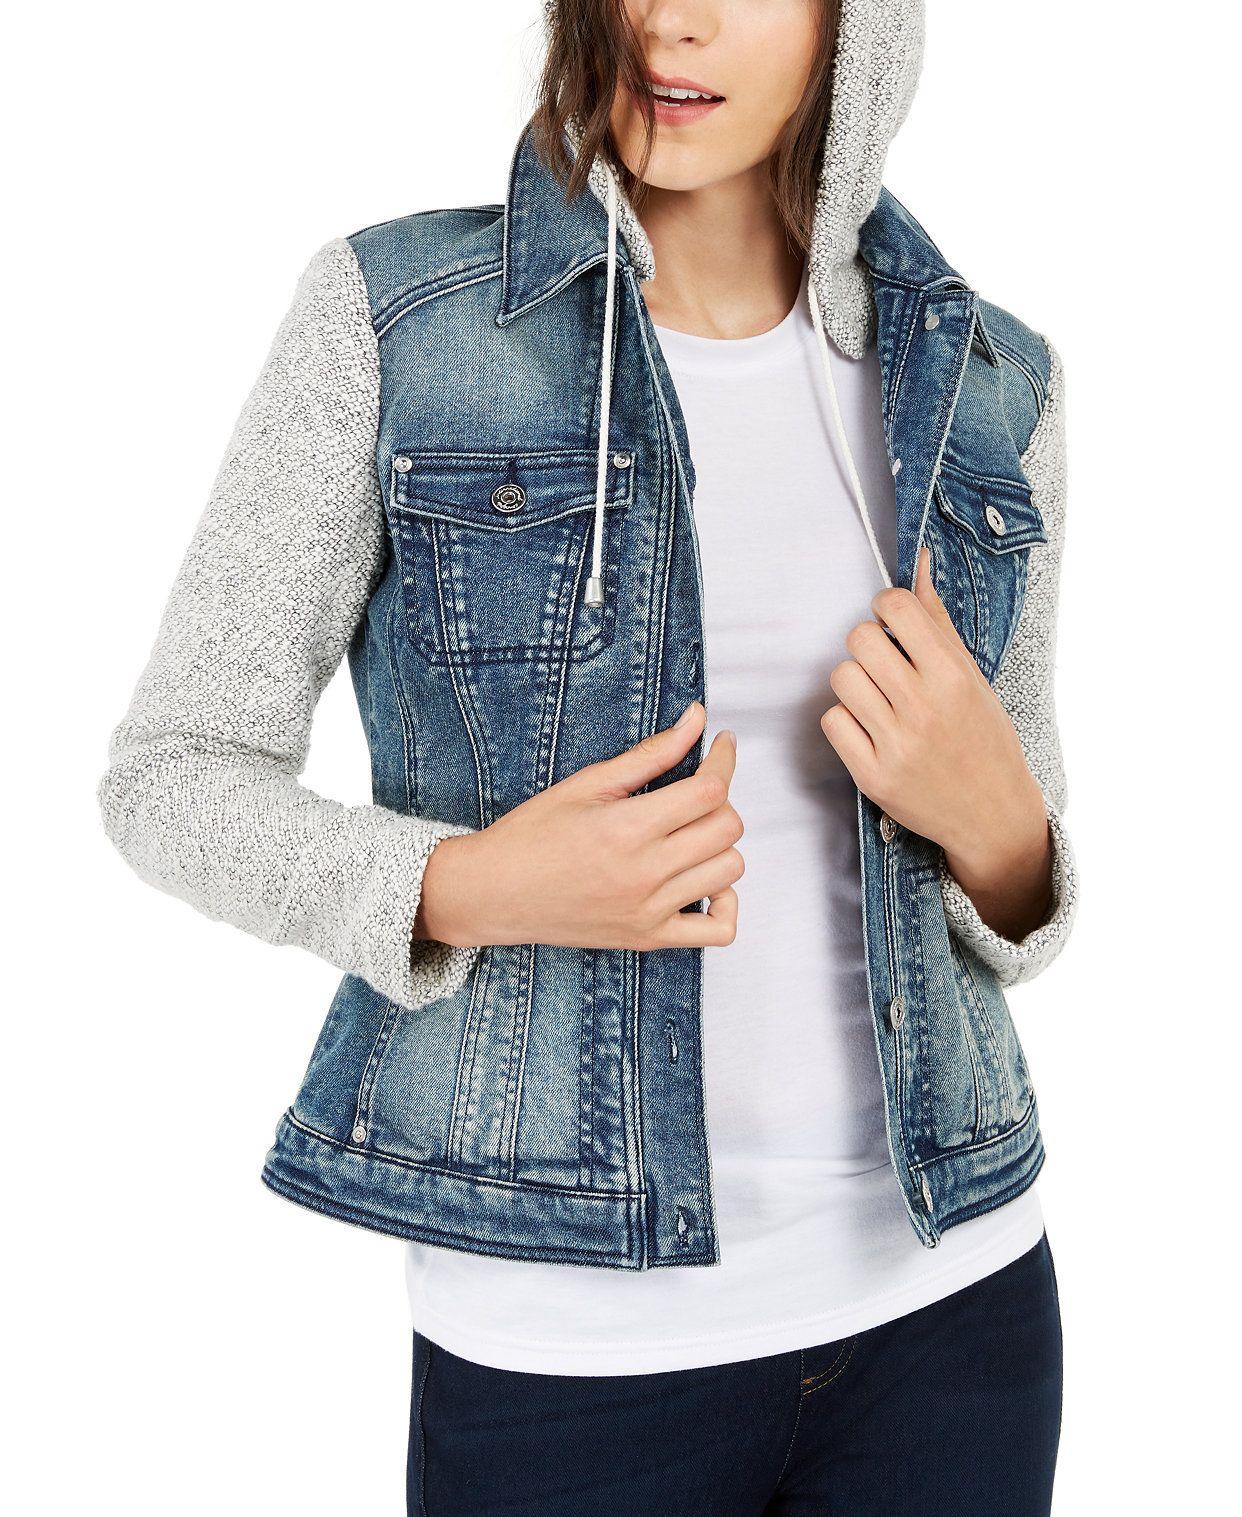 Inc Knit Denim Hoodie Jacket Created For Macy S Denim Jacket With Hoodie Denim Hoodie Blazer Jackets For Women [ 1517 x 1242 Pixel ]